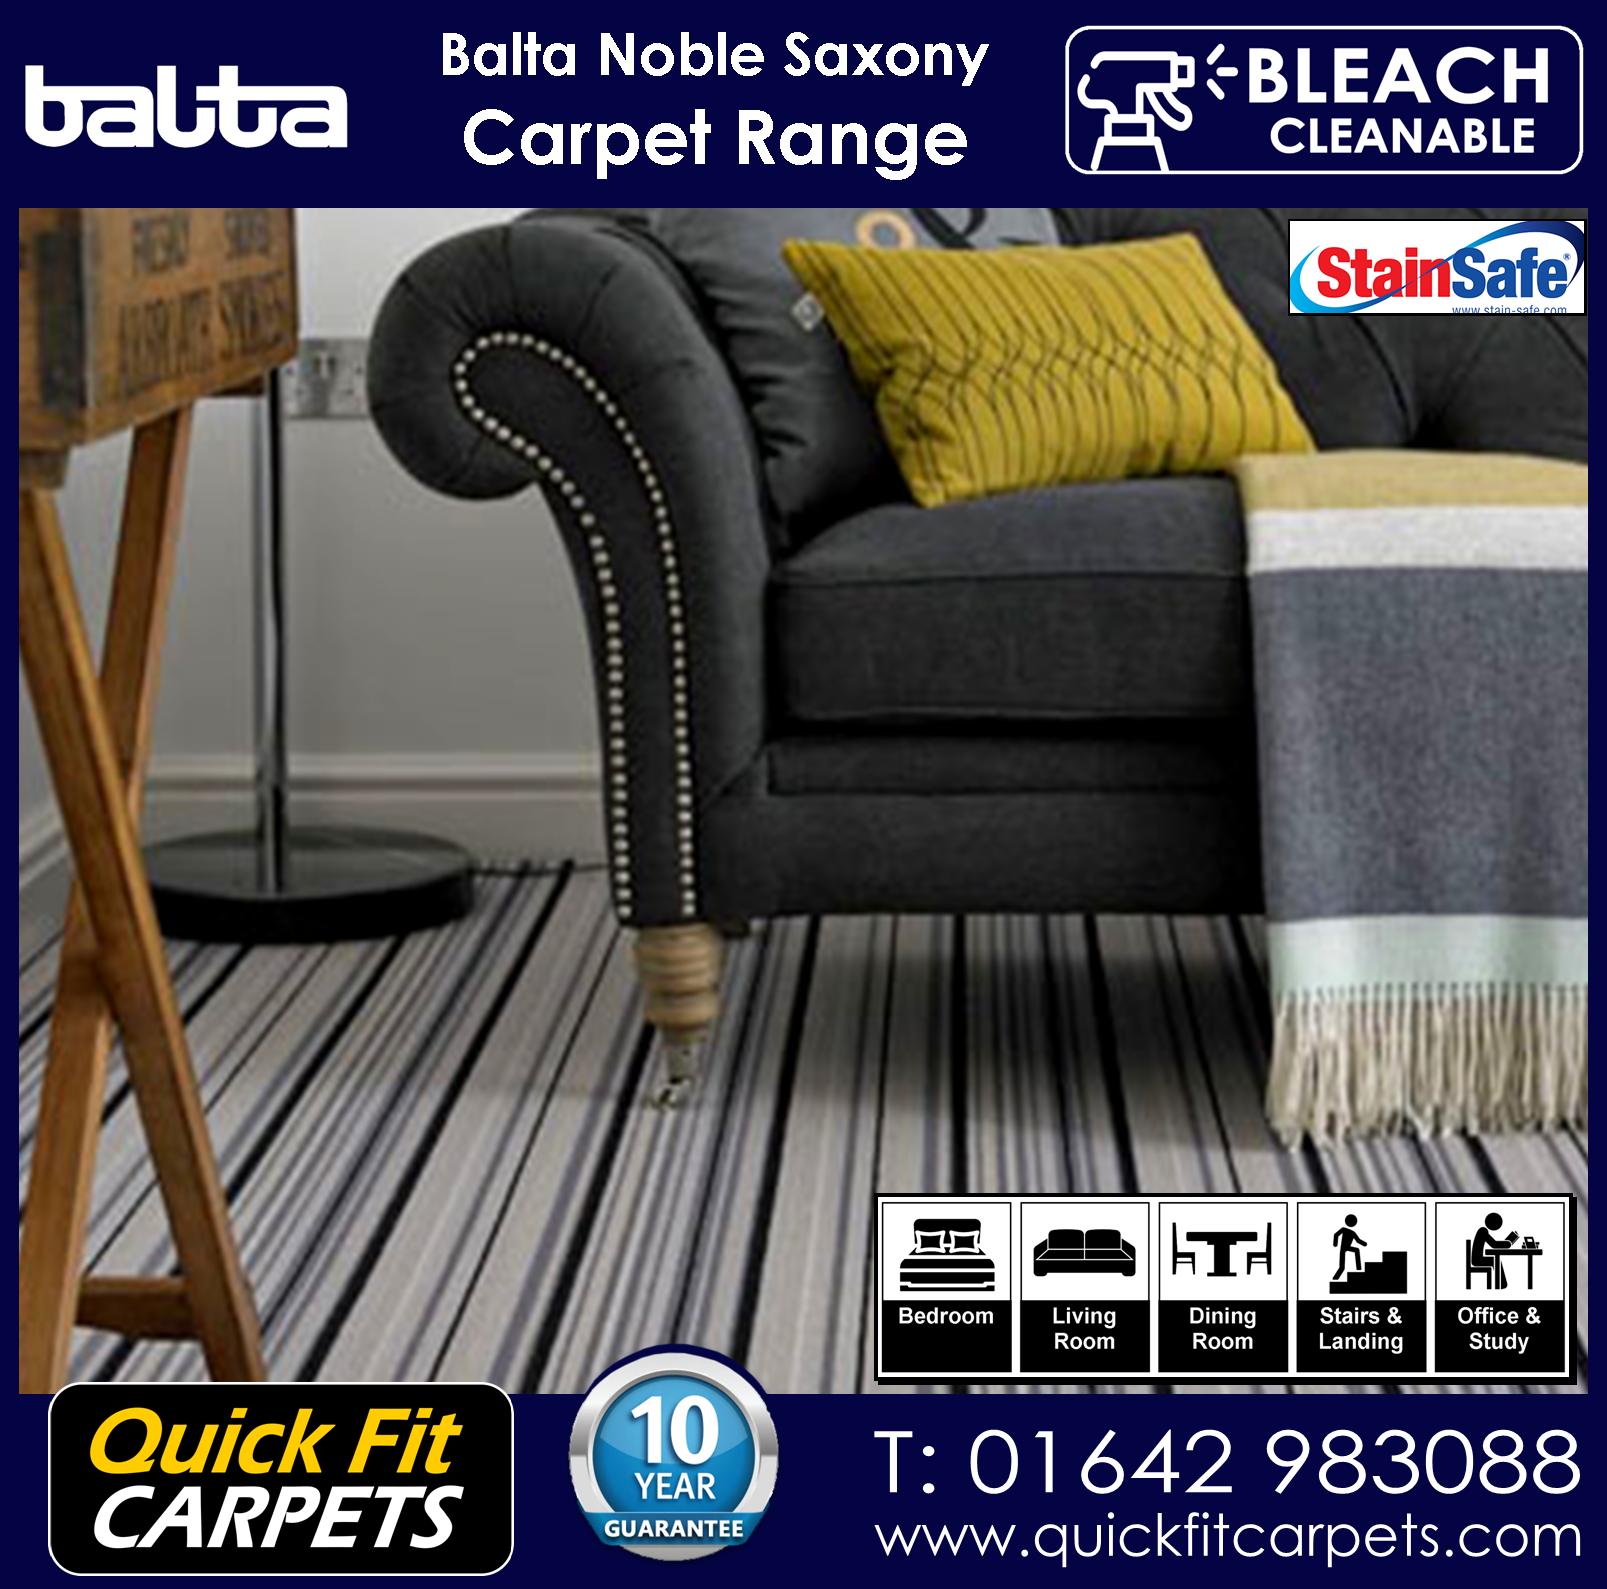 Quick Fit Carpets Balta Luxury Pile Carpet Range